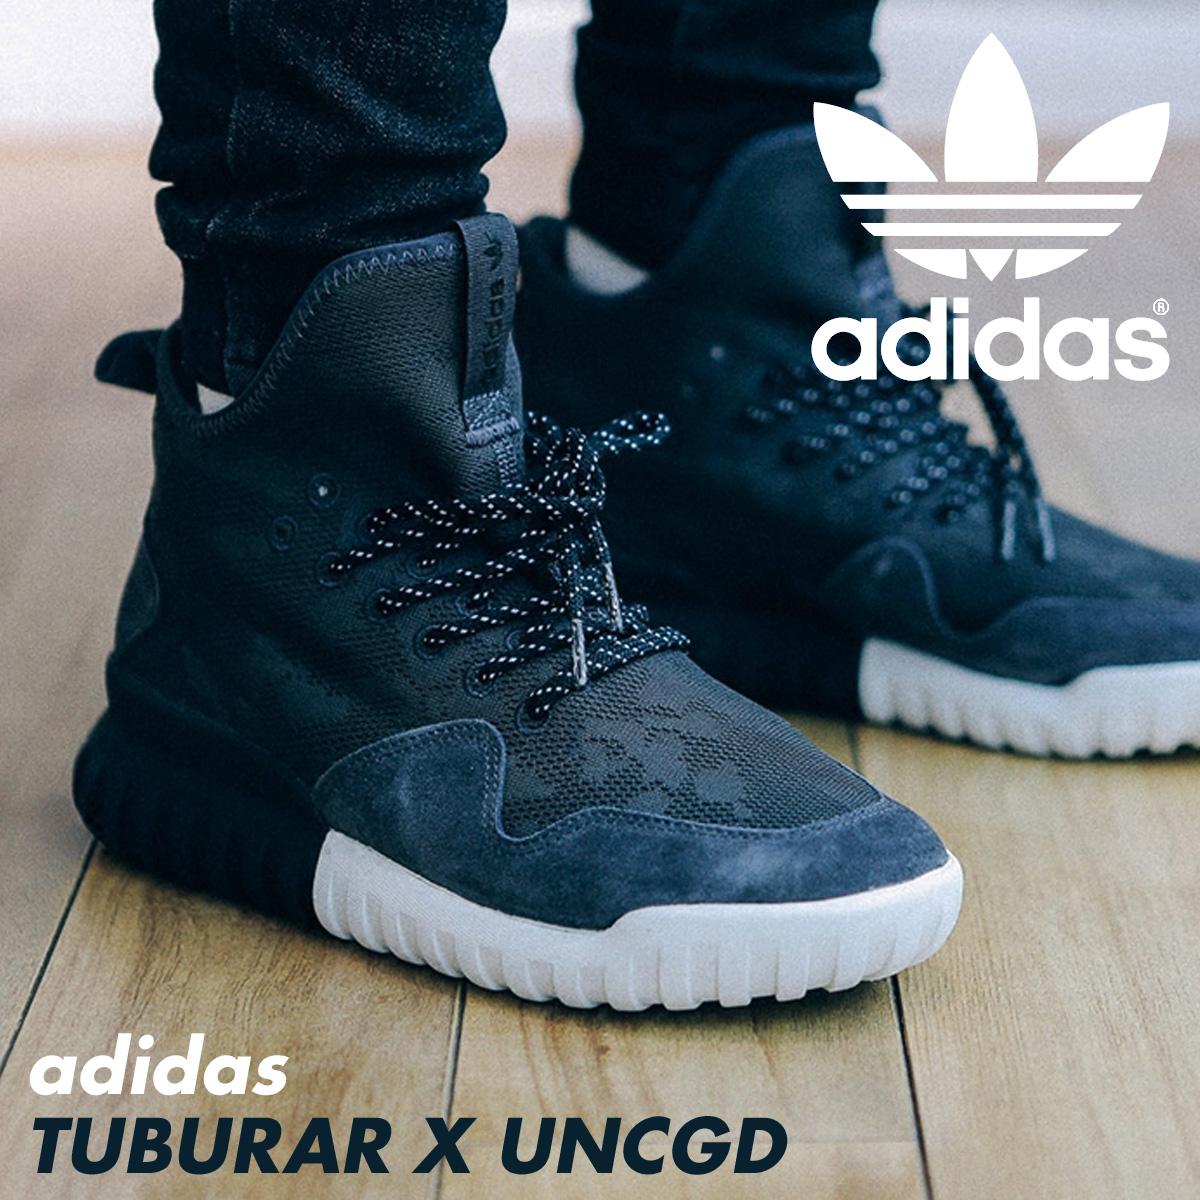 finest selection 7a5de c32b9 ... adidas チューブラー X Adidas originals チュブラースニーカー TUBULAR X UNCGD men BB8404  BB8405 shoes ...